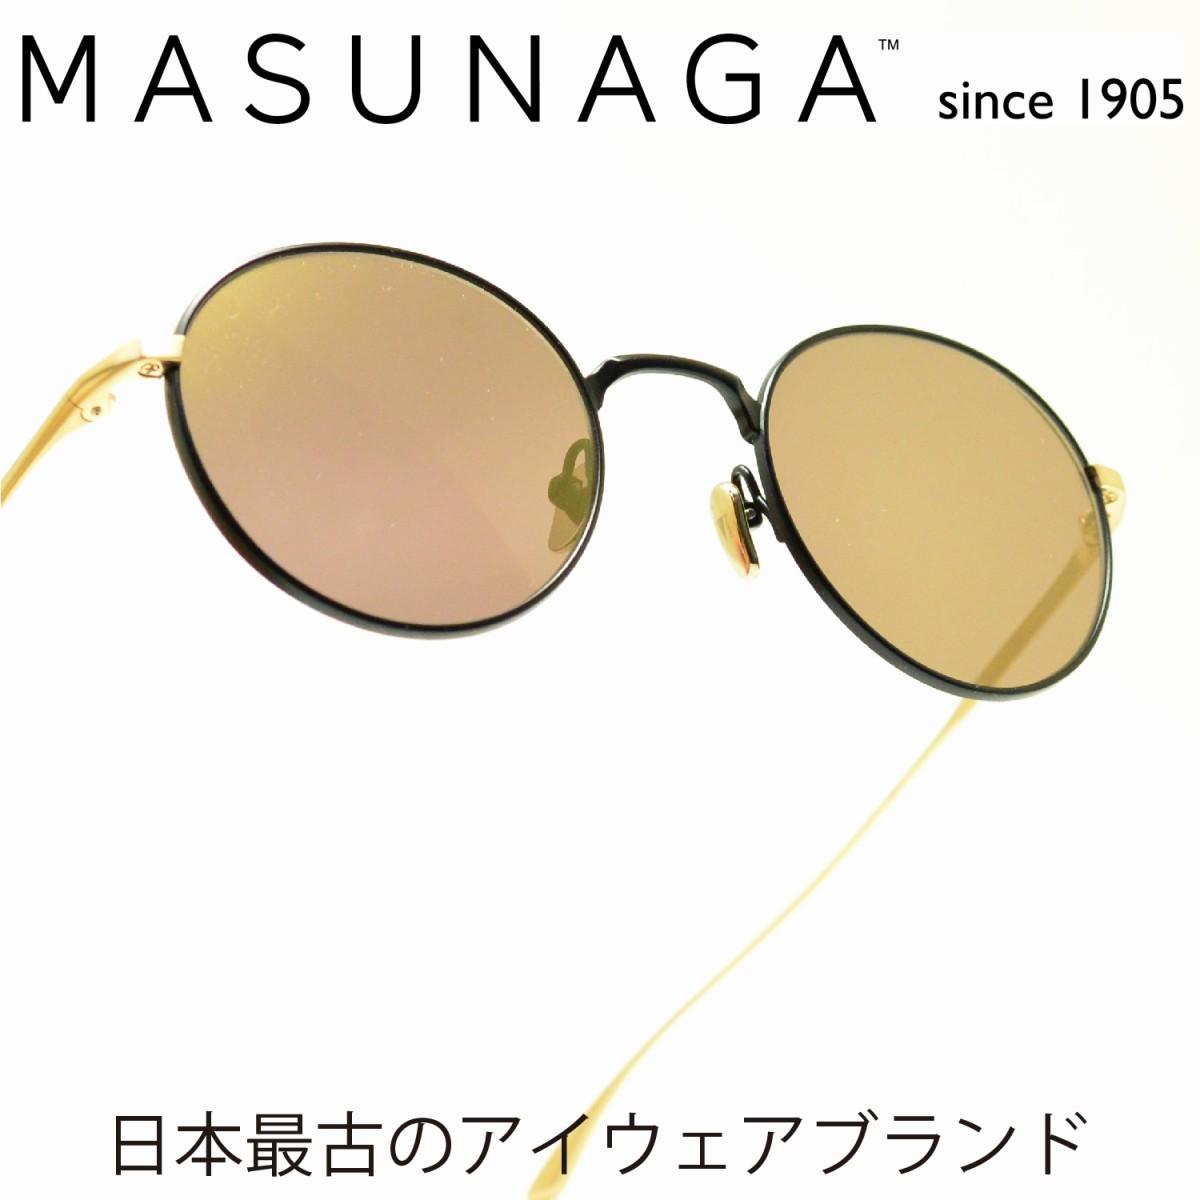 MASUNAGA Since1905 WRIGHT COL-S39メガネ 眼鏡 めがね メンズ レディース おしゃれ ブランド 人気 おすすめ フレーム 流行り 度付き レンズ